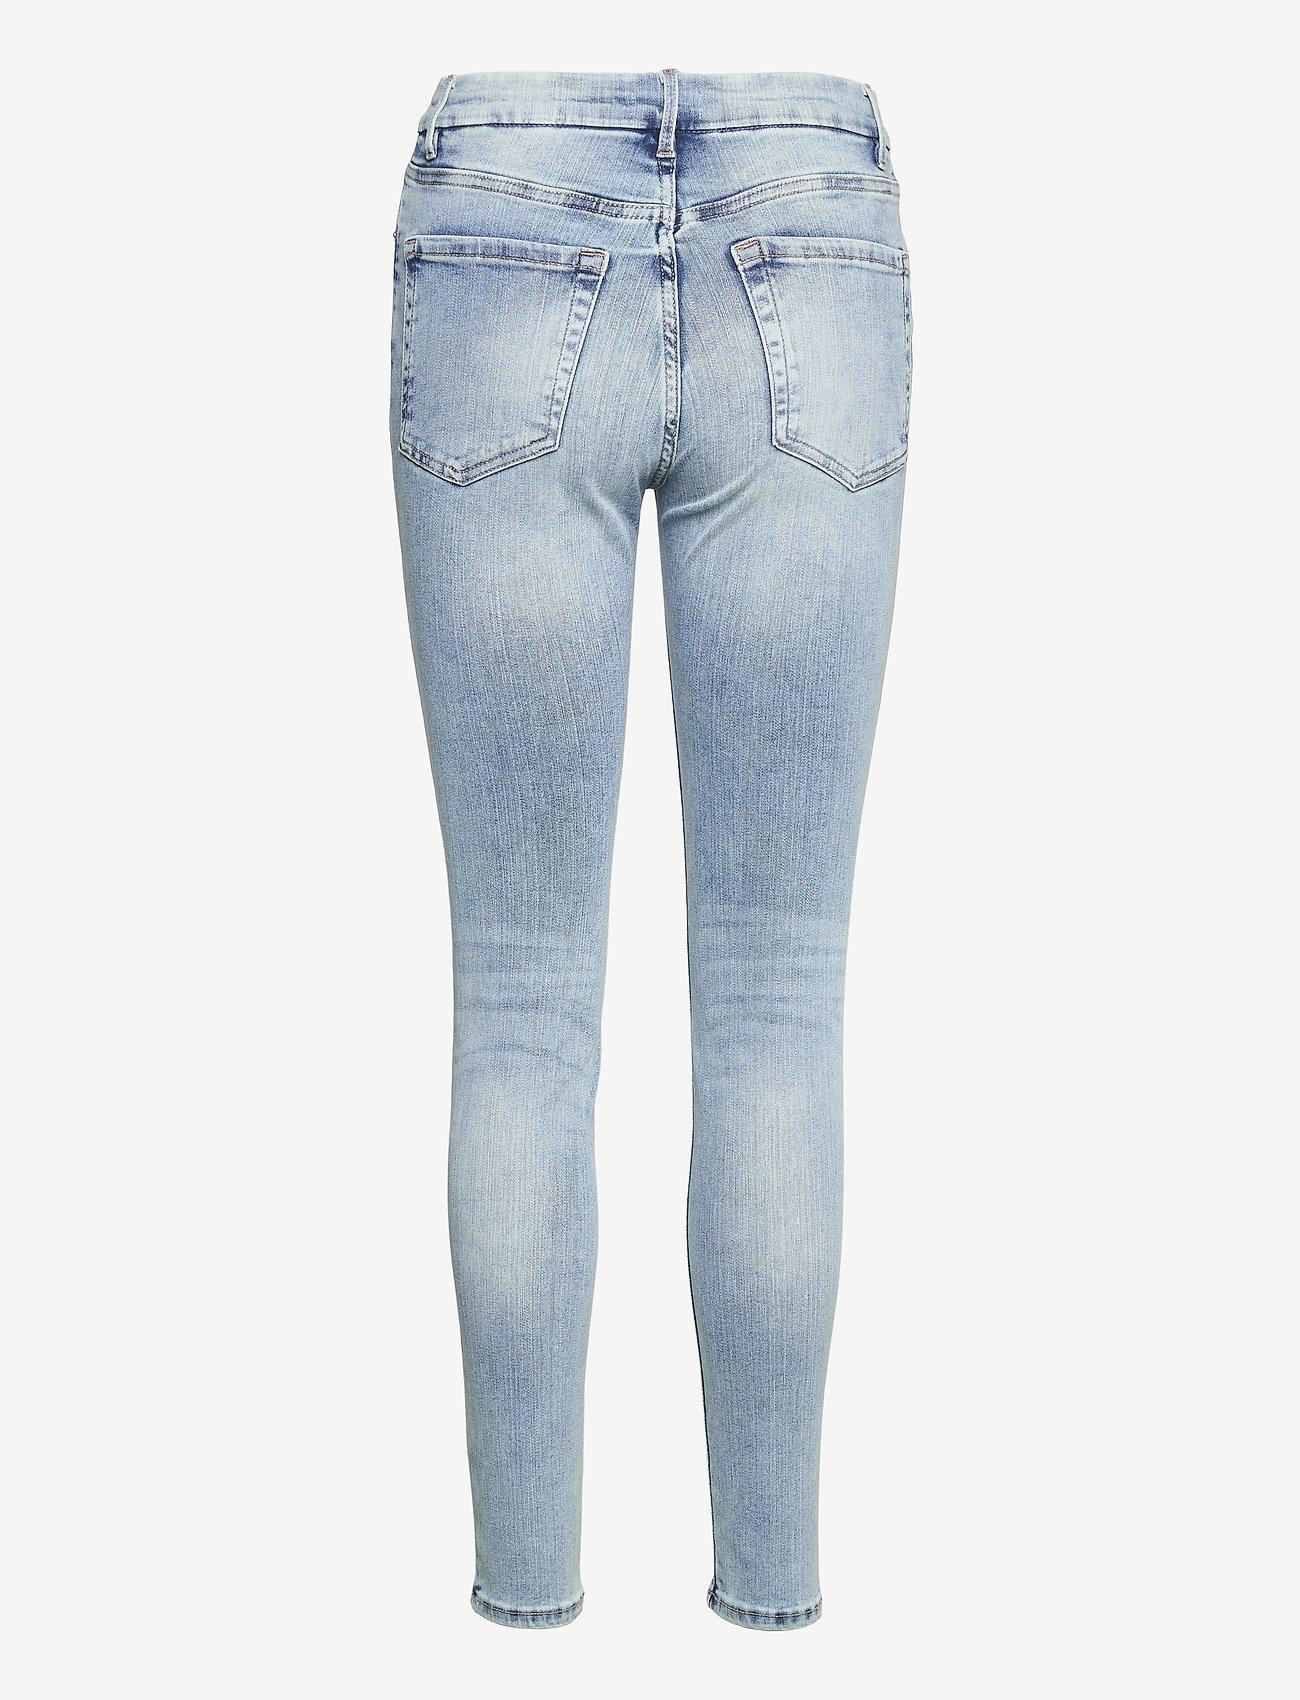 Lindex - Trousers denim Clara lt blue - slim jeans - blue - 1